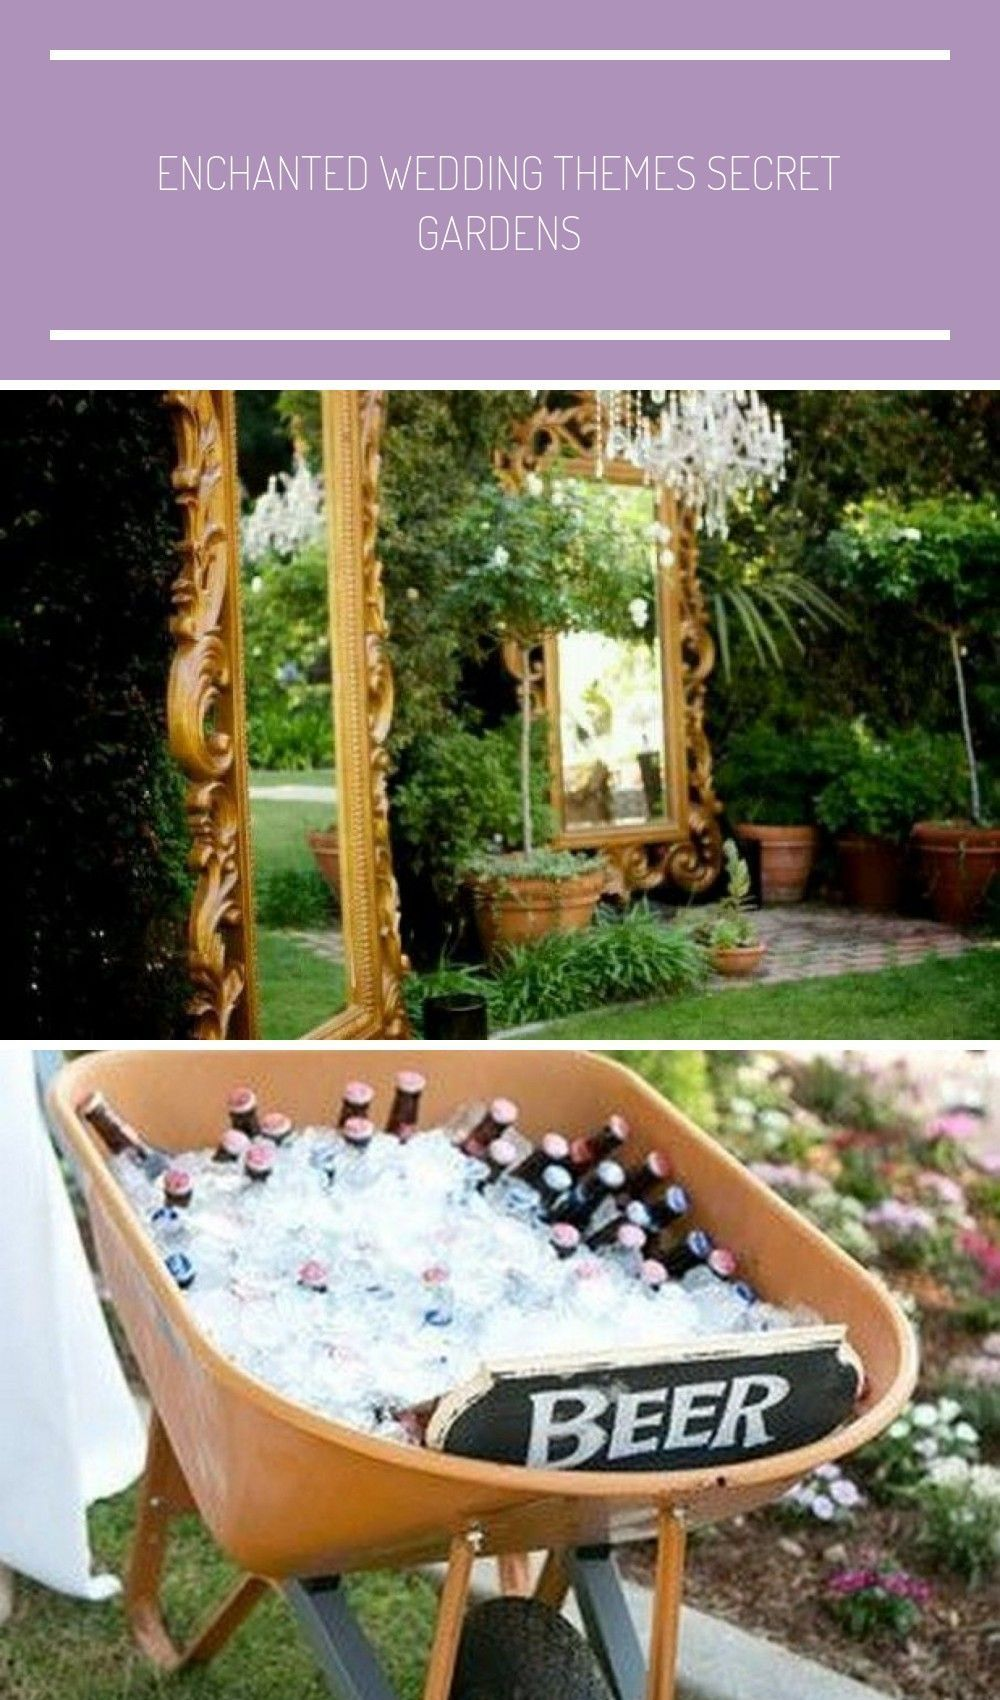 Wedding Enchanted Wedding Themes Secret Gardens Wedding Enchanted Wedding Themes Secret Gardens garden wedding theme